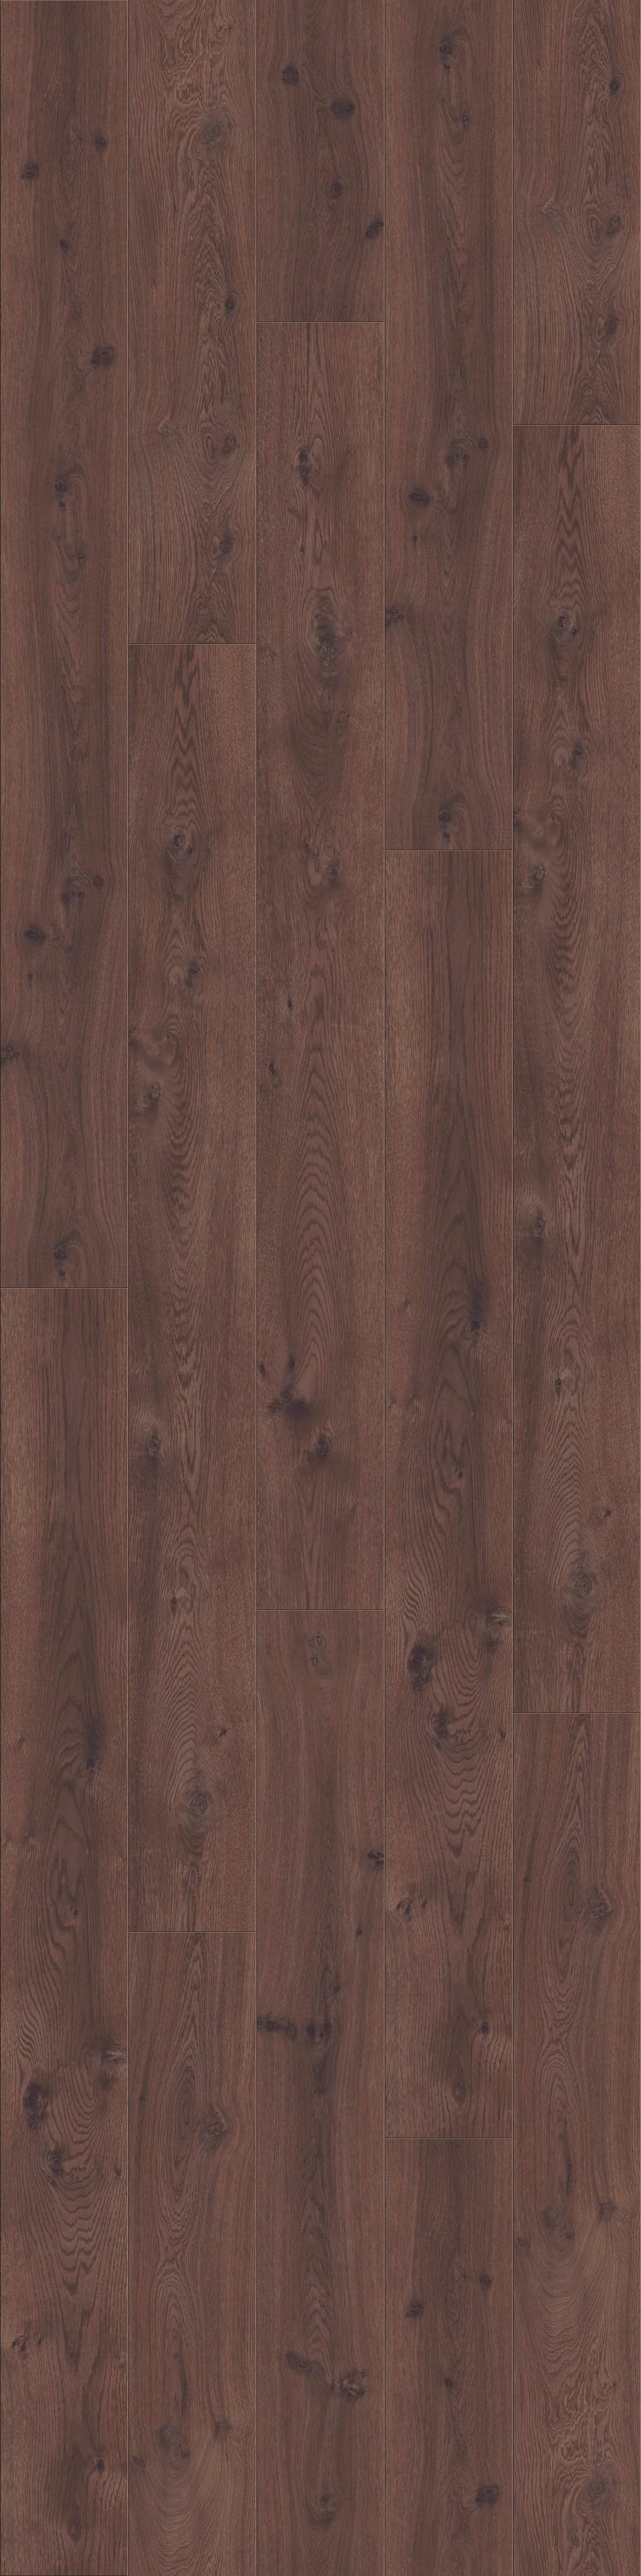 l0223 01754 chocolate oak plank. Black Bedroom Furniture Sets. Home Design Ideas